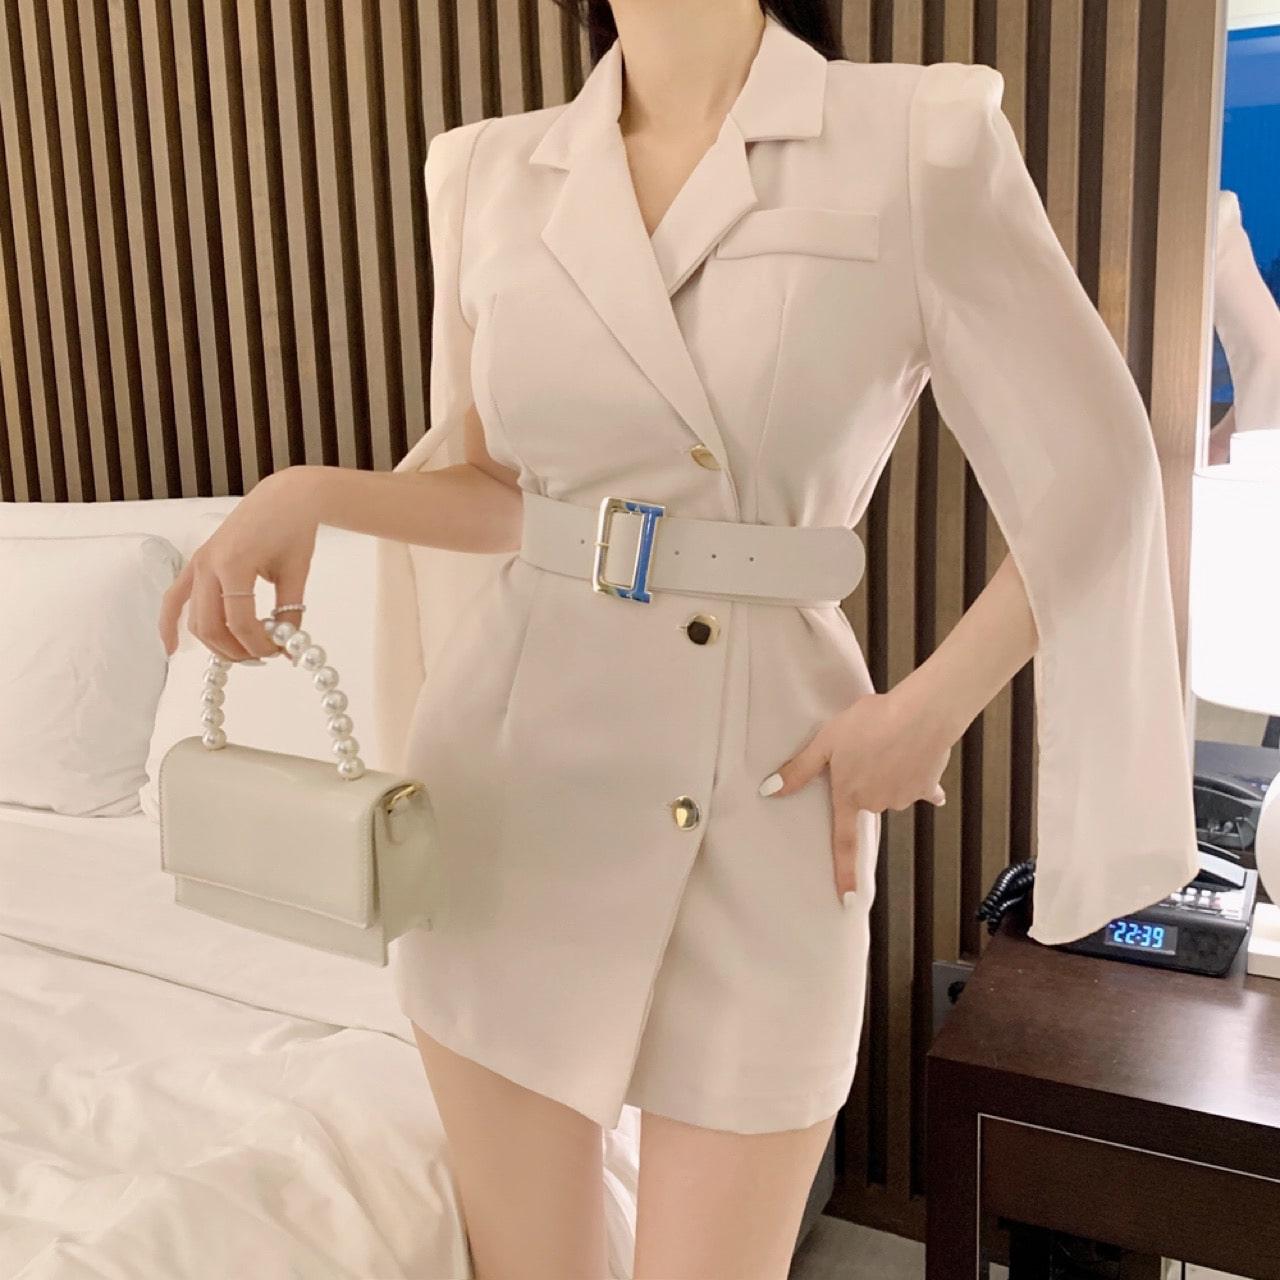 uinme-쉬폰 시스루 케이프 원피스 - [ 3color ] - 유인미쉬폰 시스루 케이프 원피스 - [ 3color ] - 유인미♡韓國女裝外套